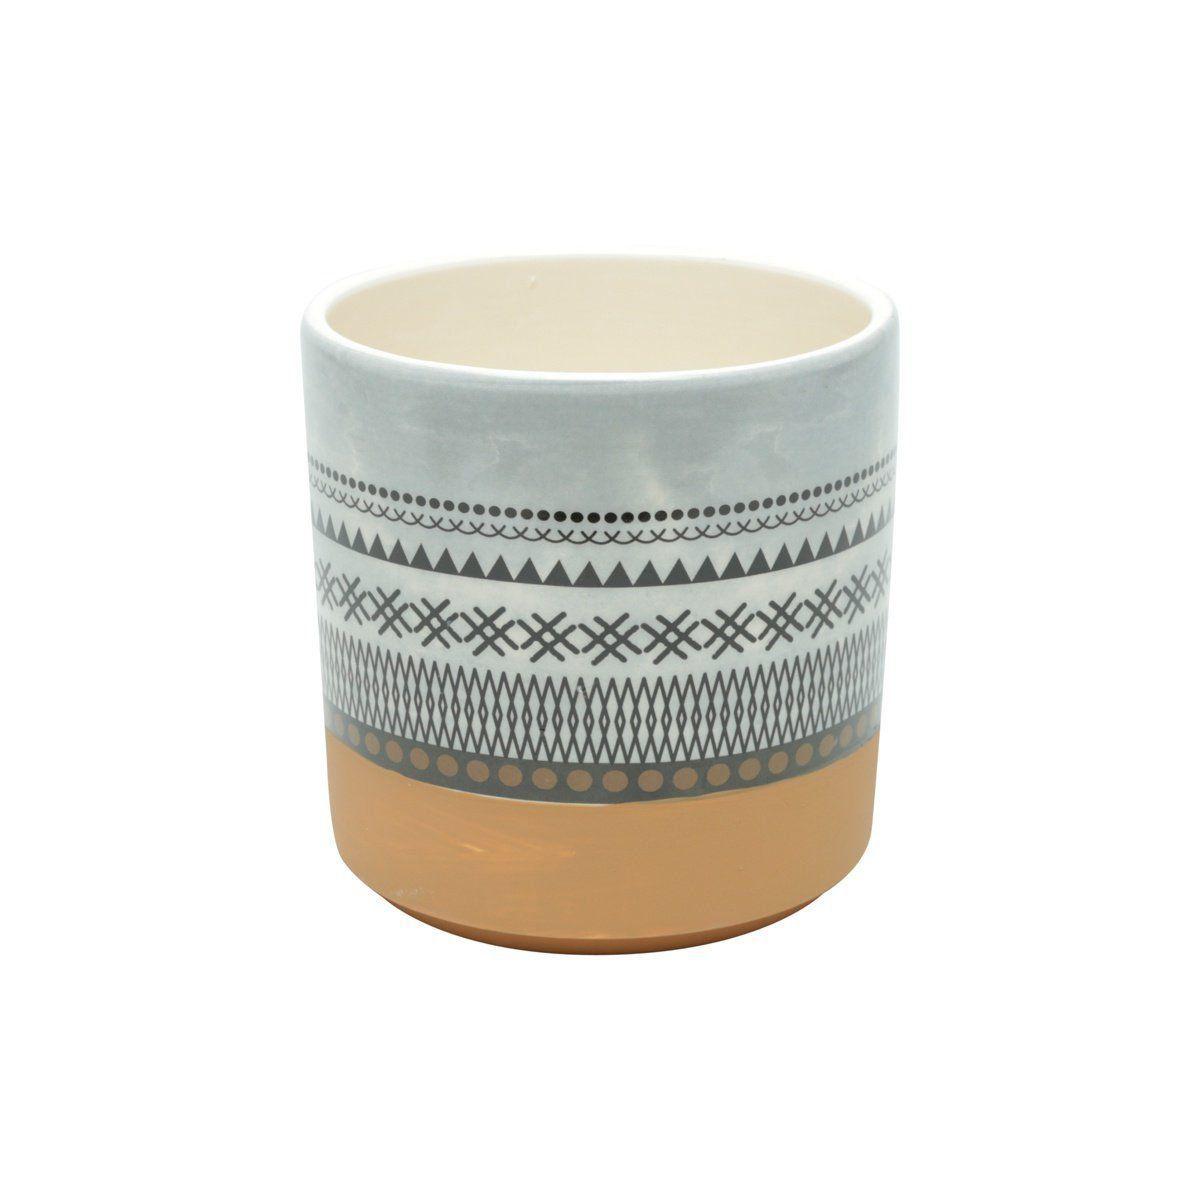 Vaso de Cerâmica Asteca Colorido 14cm x 14cm - 42059